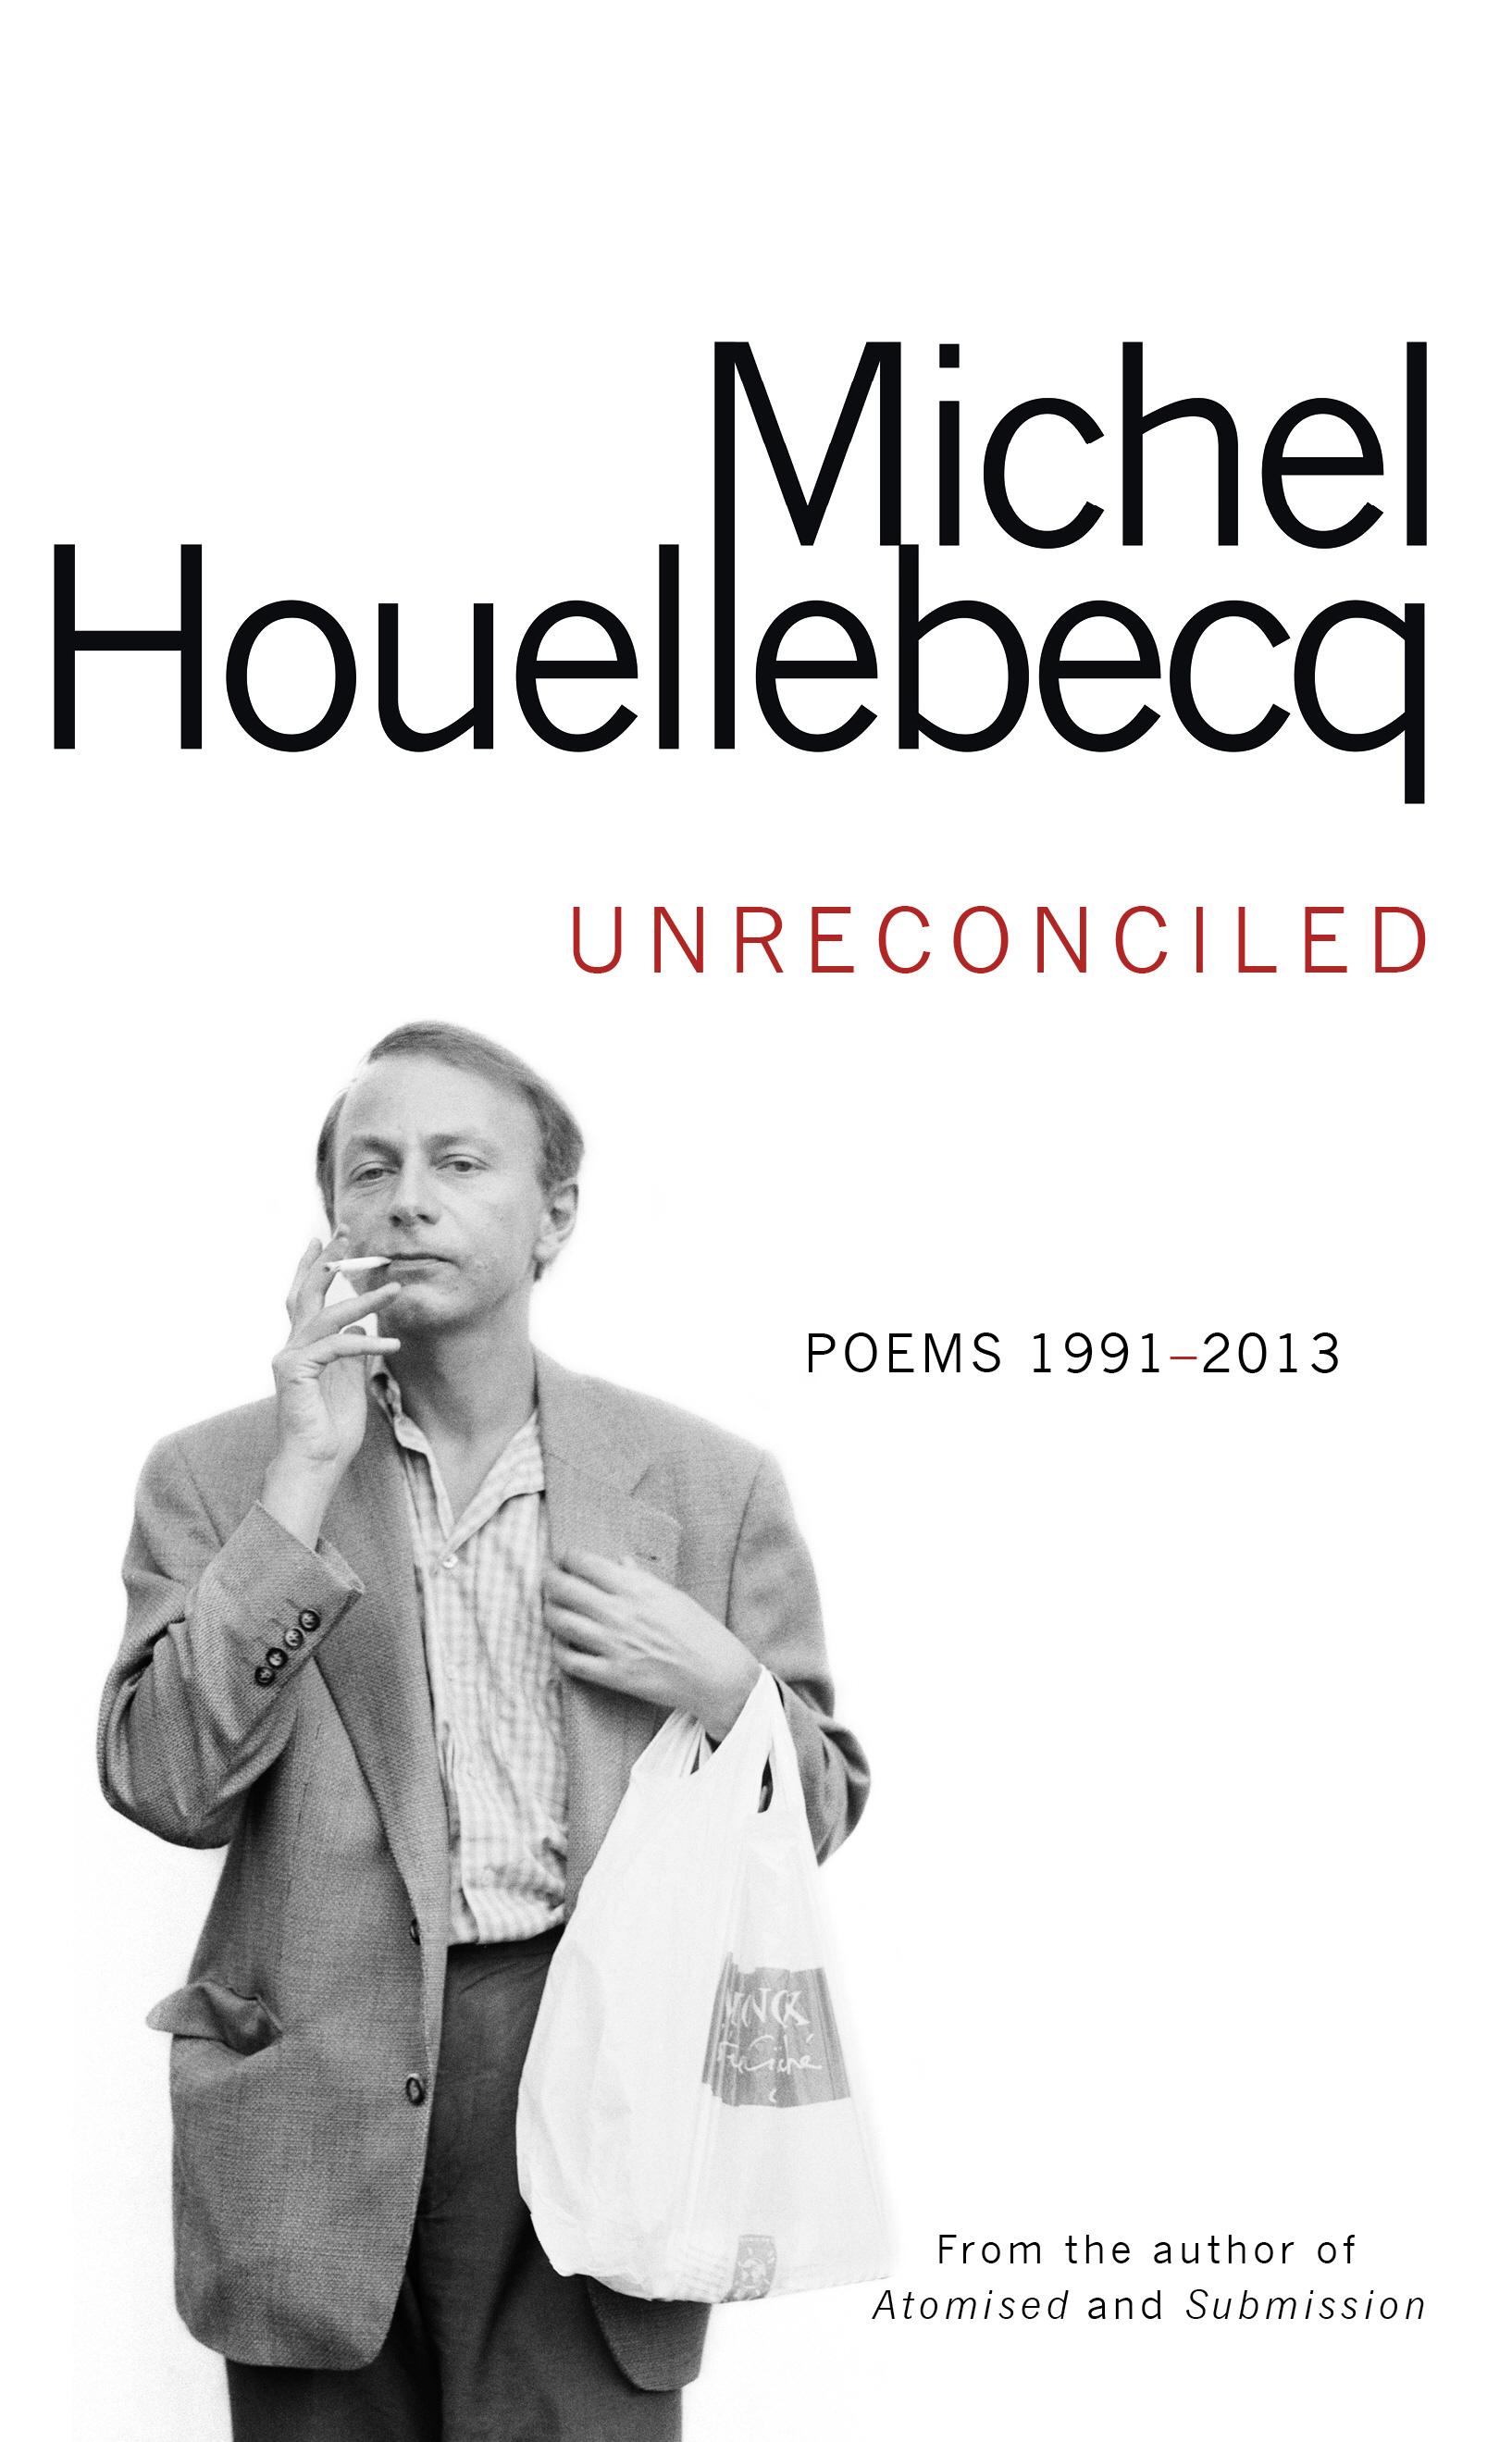 Sunday Book: Michel Houellebecq - Unreconciled: Poems 1991-2013